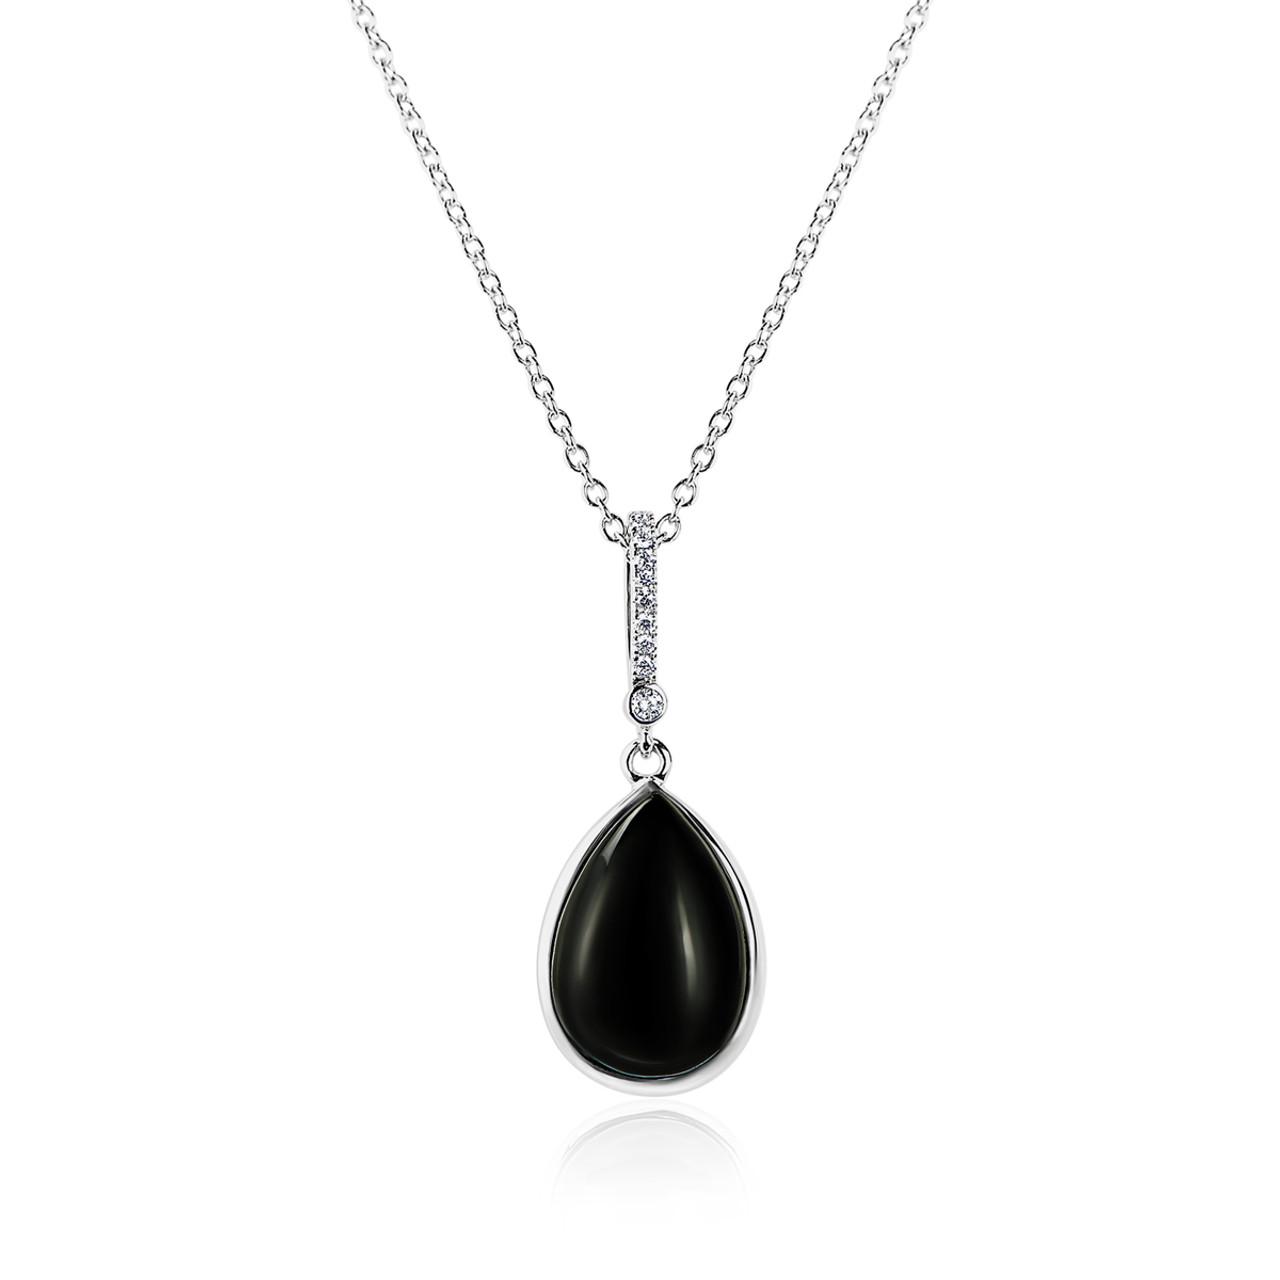 5786005a589 Pear Black Onyx and Diamond Pendant - LIBAR